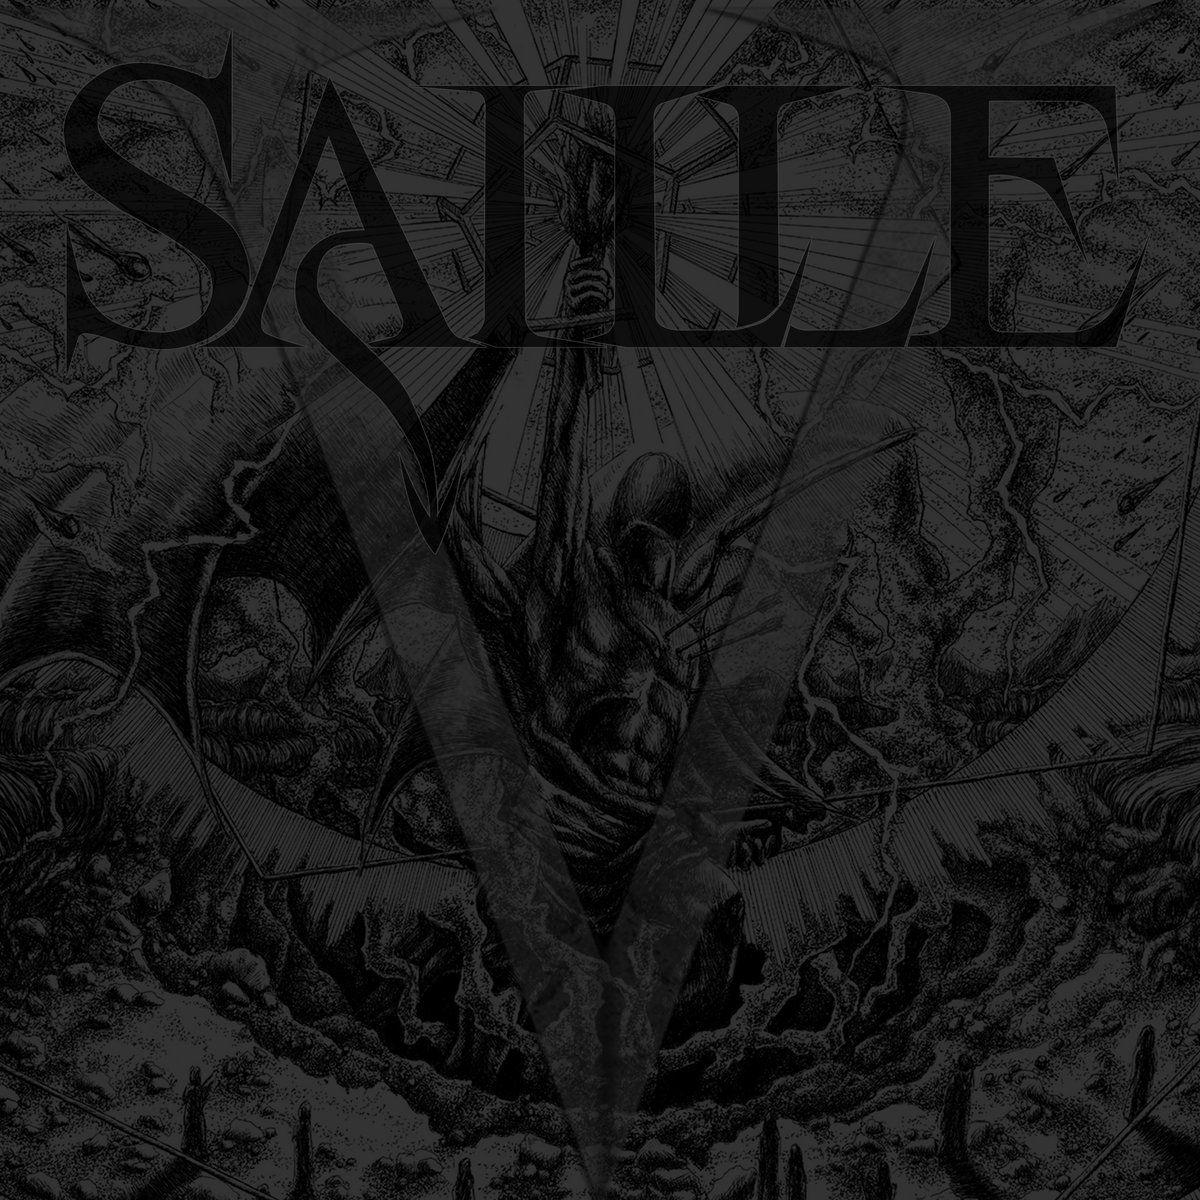 Reviews for Saille - V